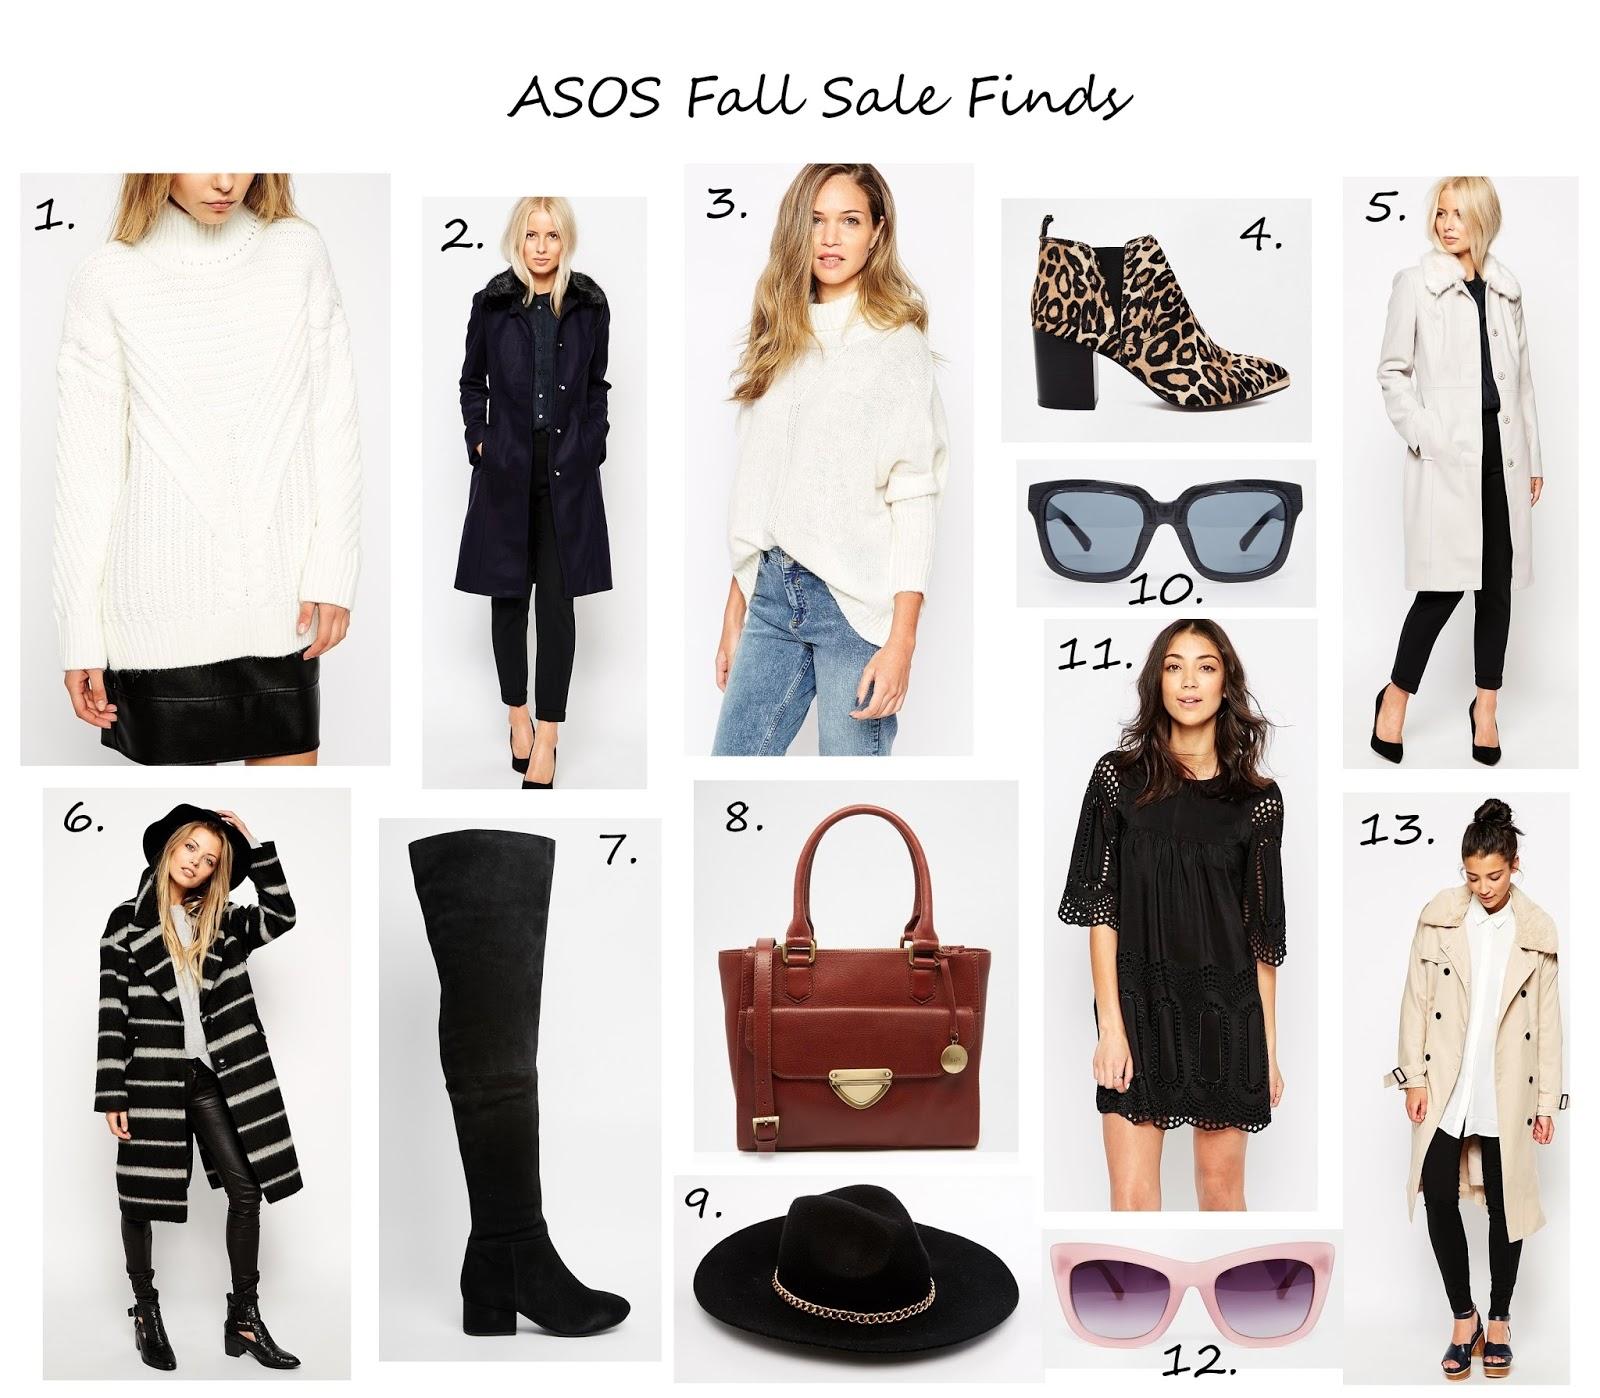 asos fall winter 2015 best sale finds